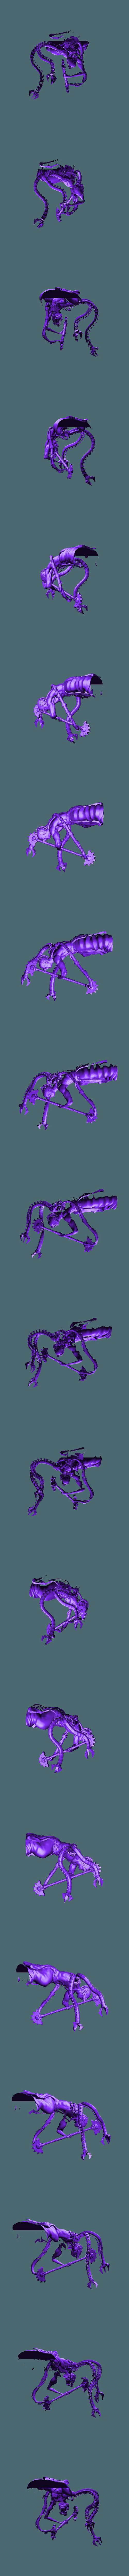 Fulgurite_9.stl Download free STL file Martian Electric Clergy • 3D print design, ErikTheHeretek